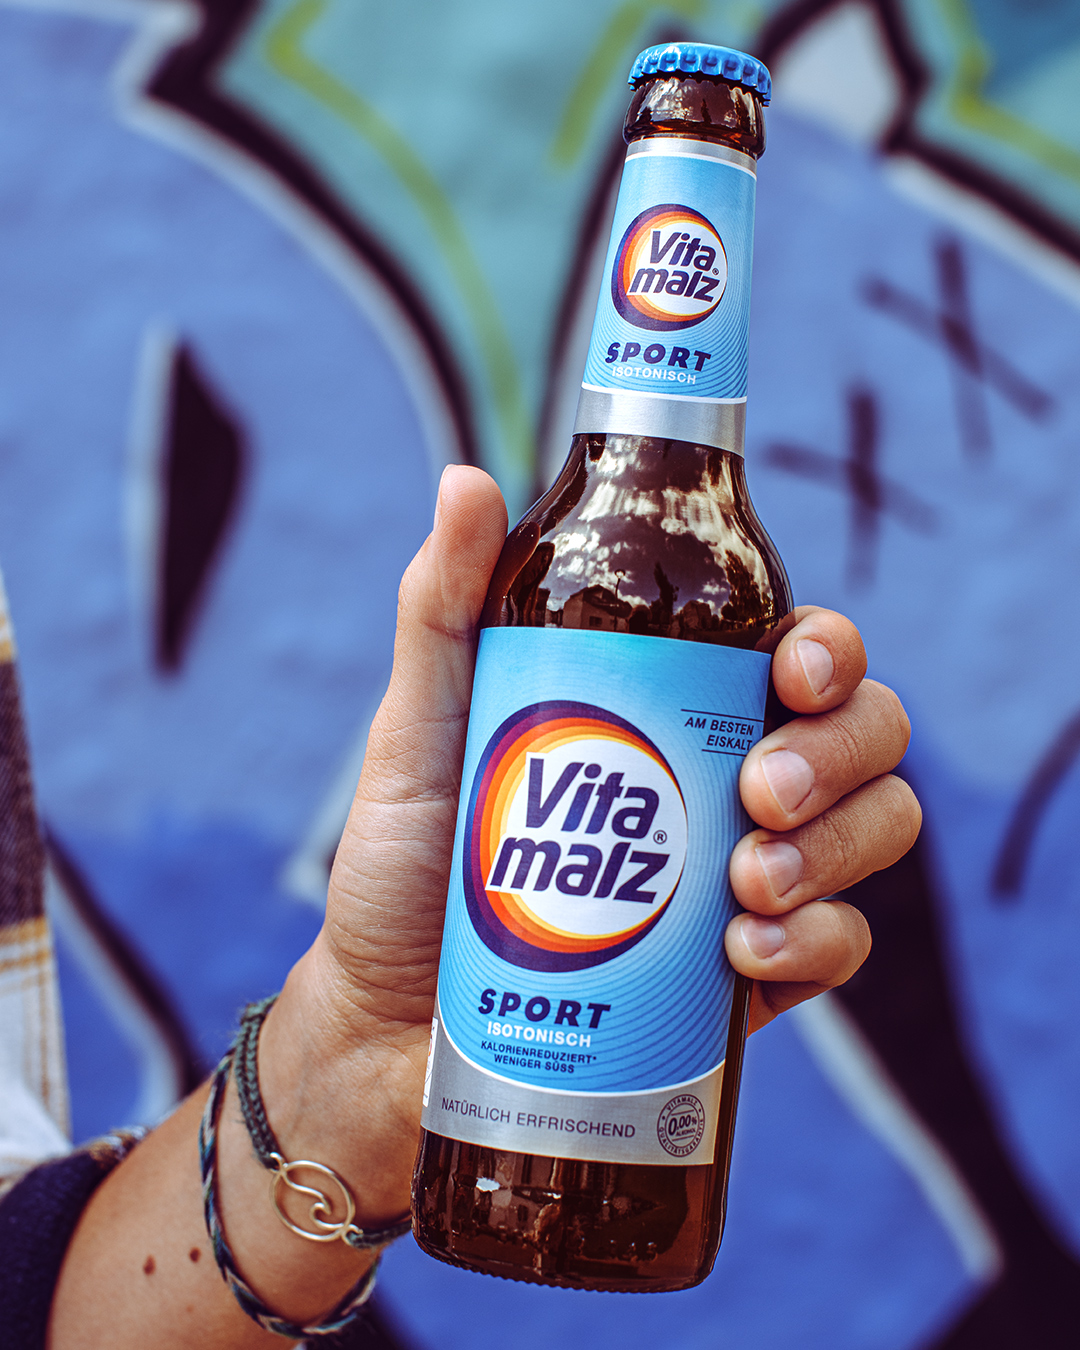 Ist In Vitamalz Alkohol